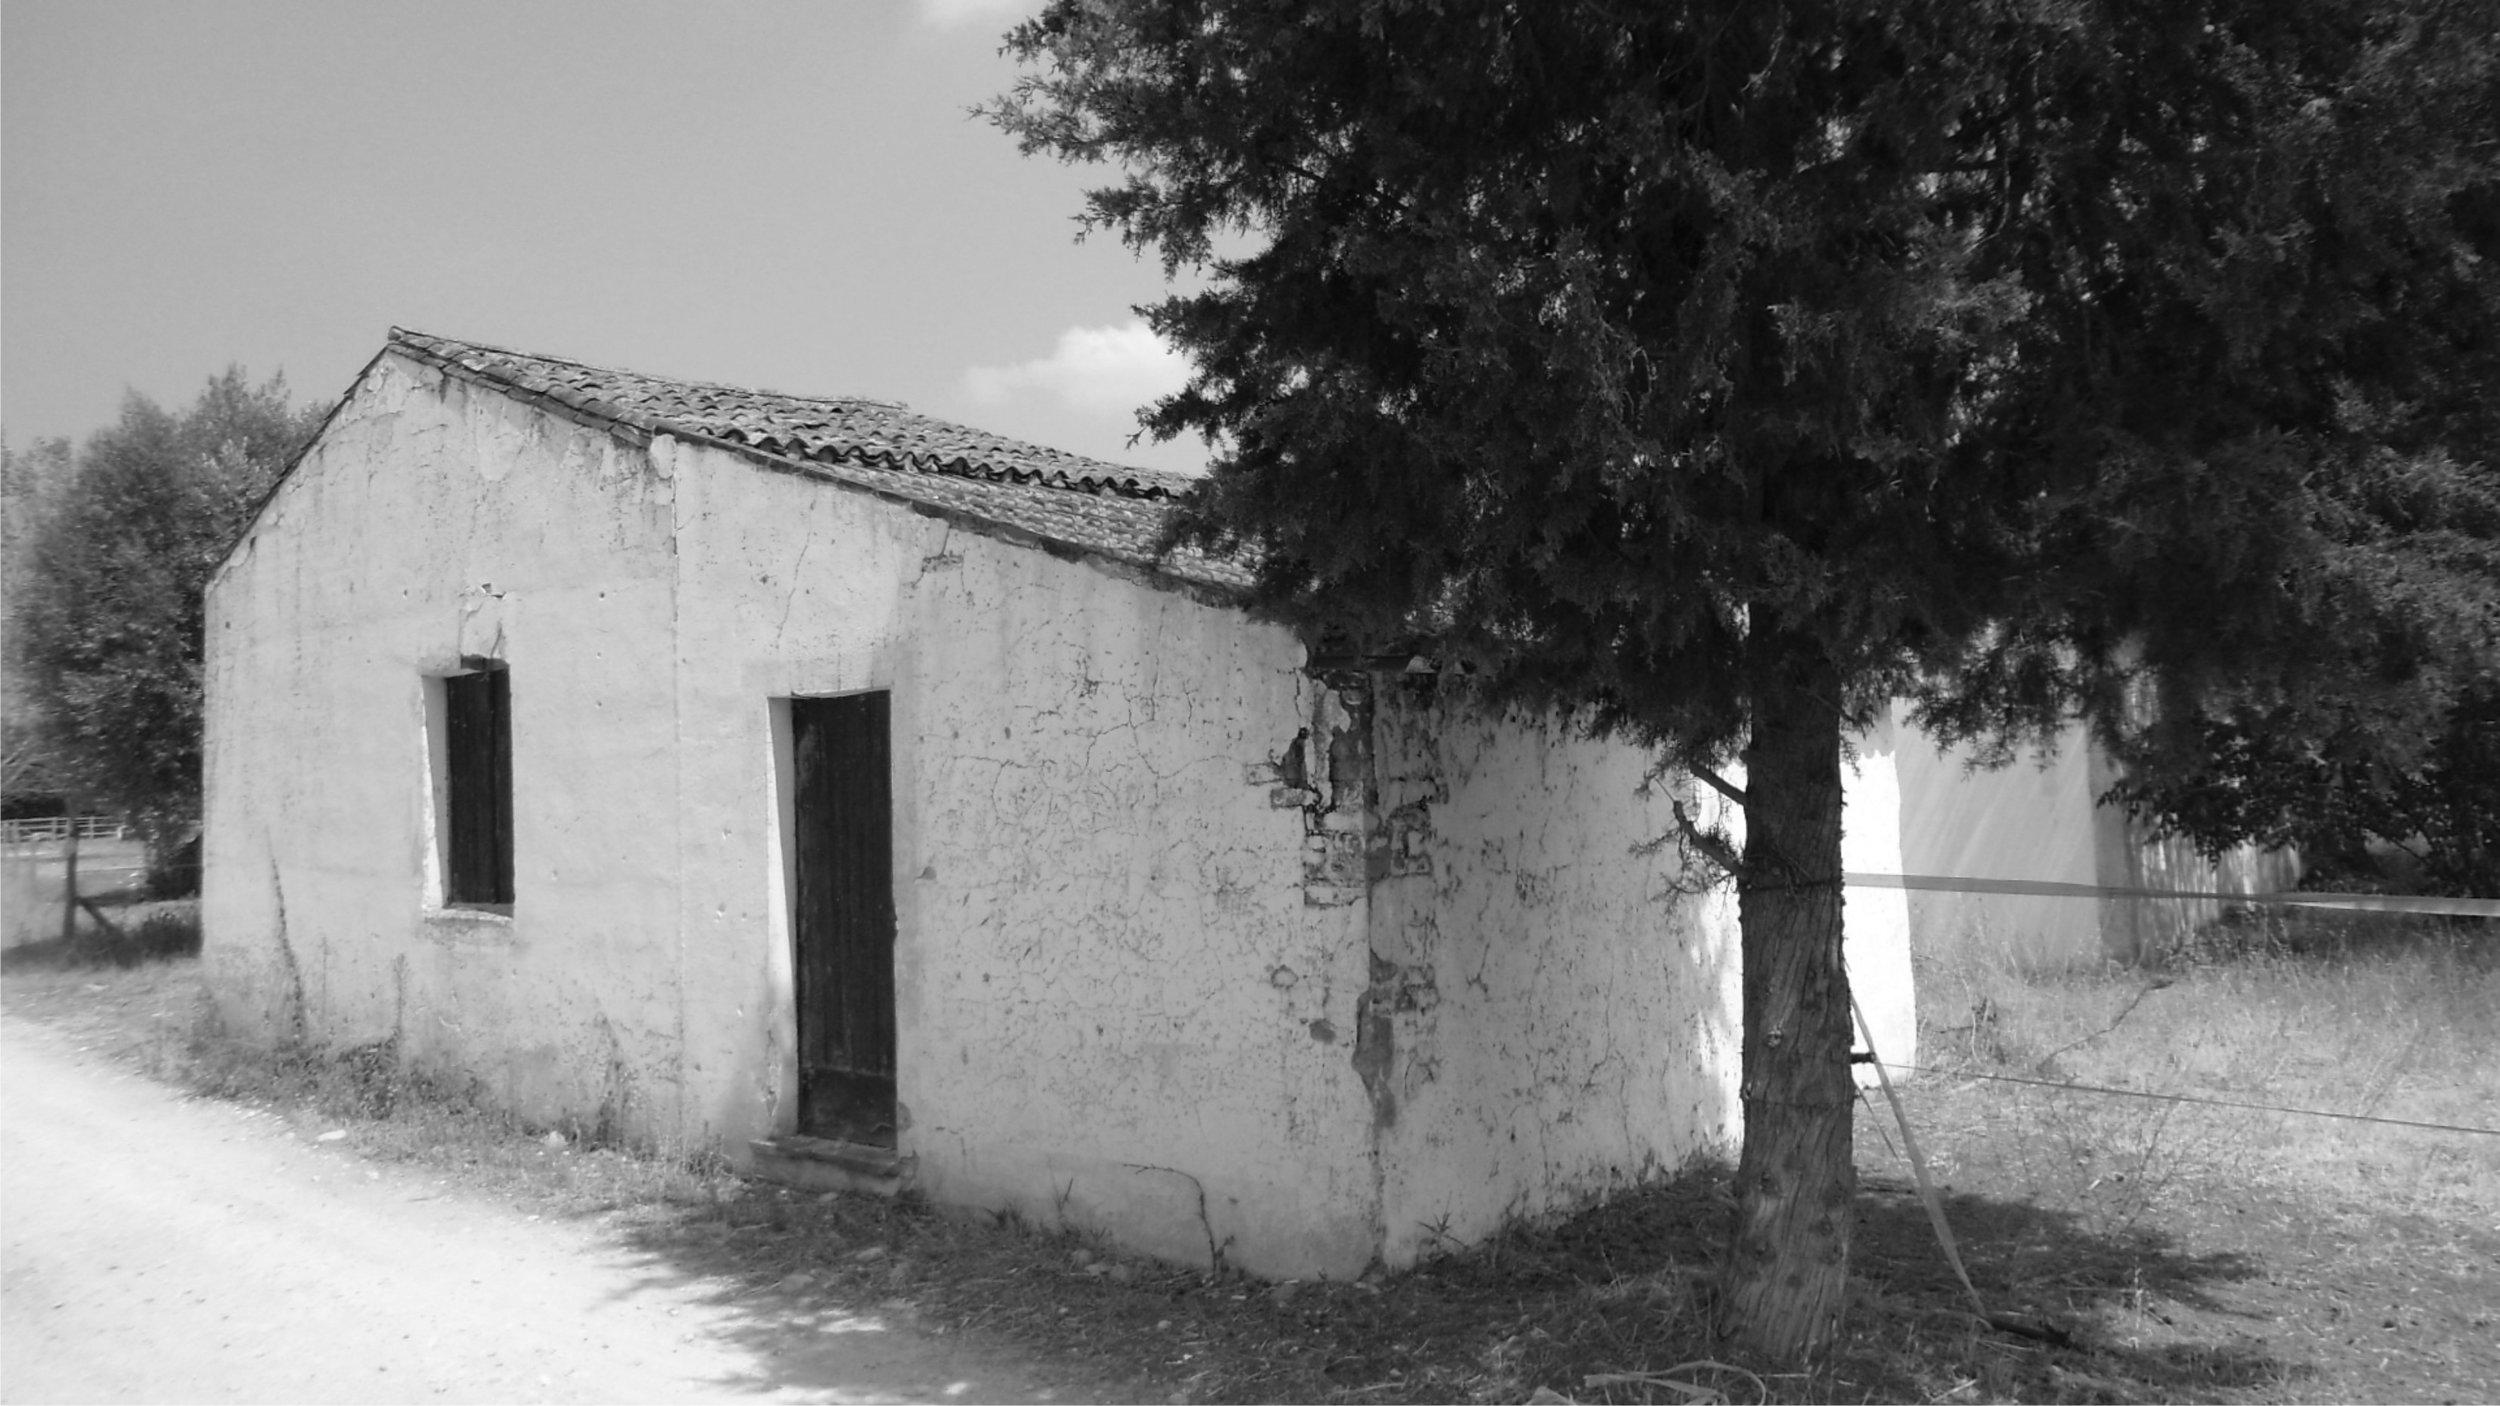 paulomiguez arquitectos - reabilitação - turismo rural - quinta feiteira - abrantes 8.jpg